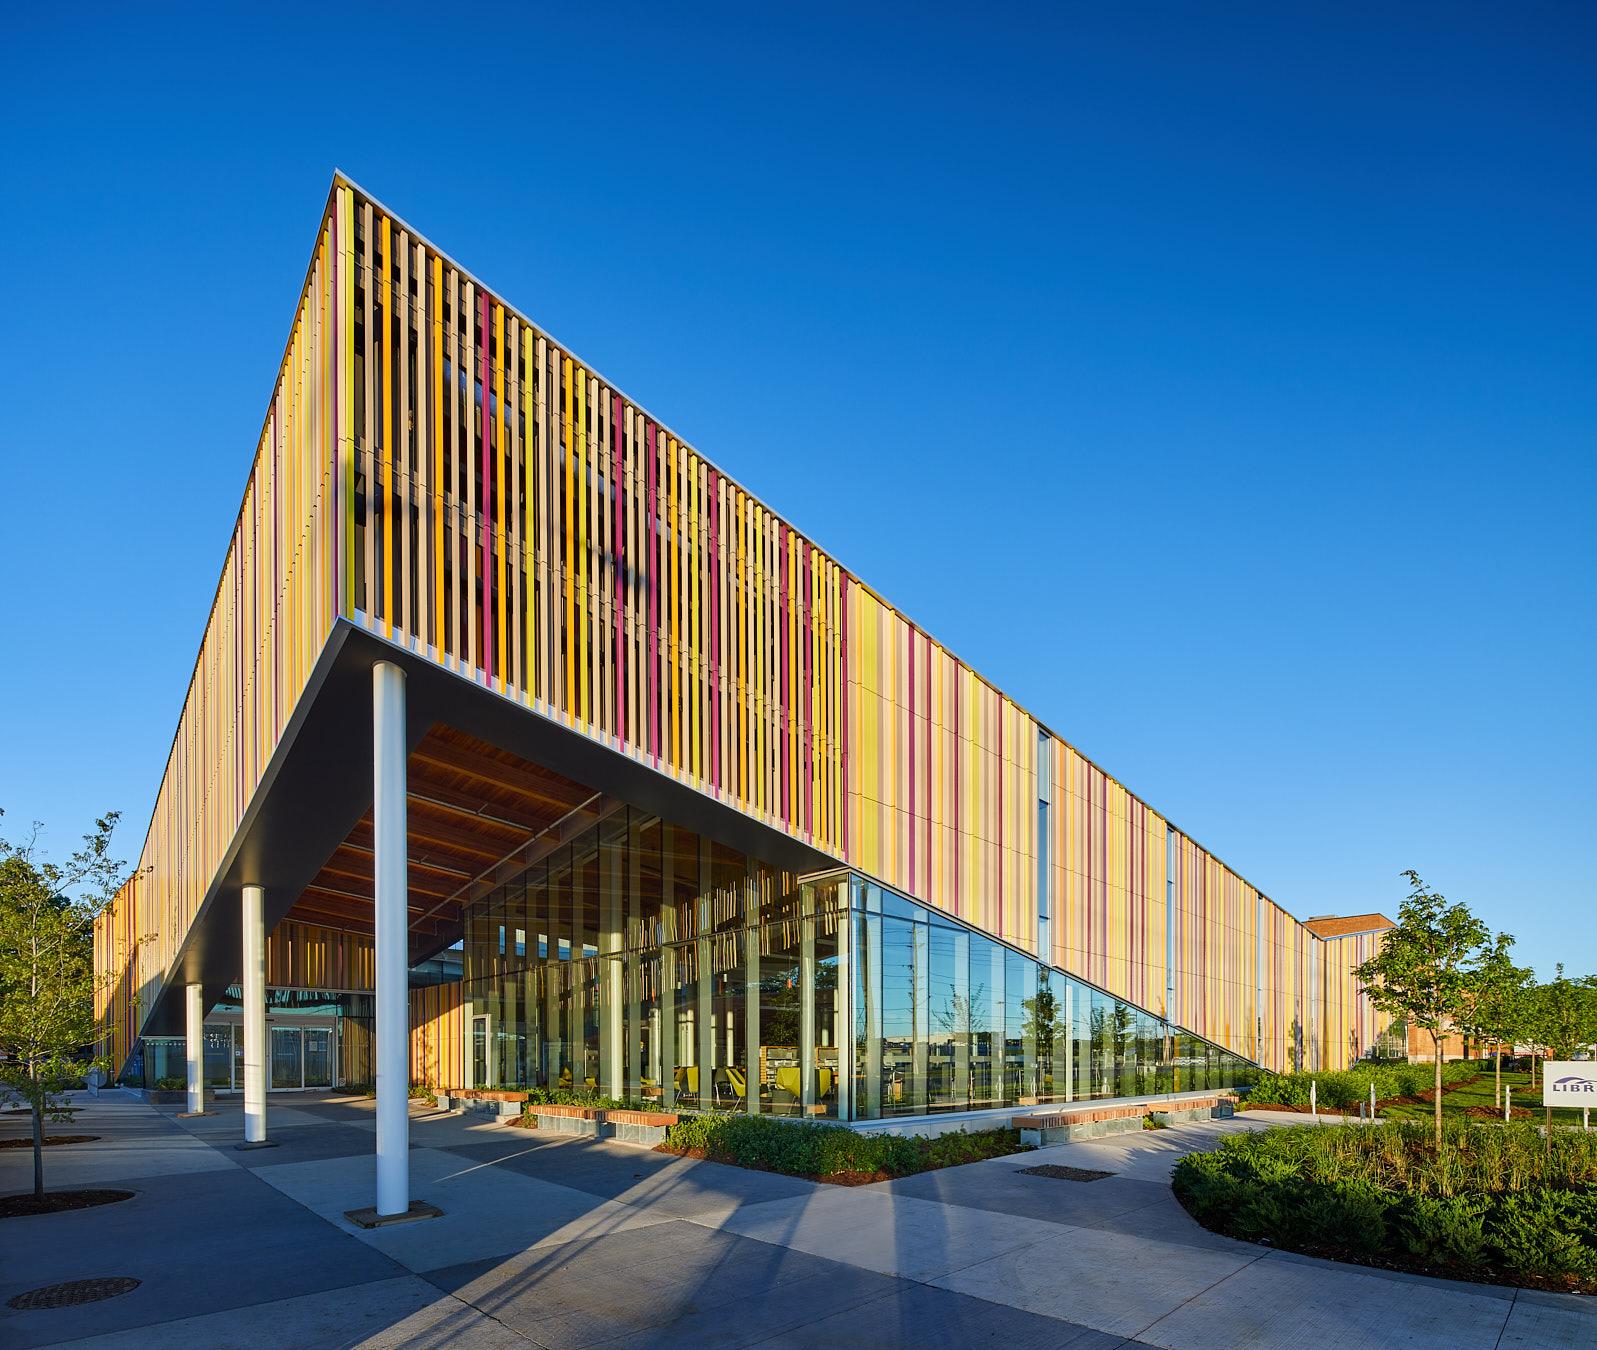 Perkins Will Designs A Vibrant Terra Cotta Facade For